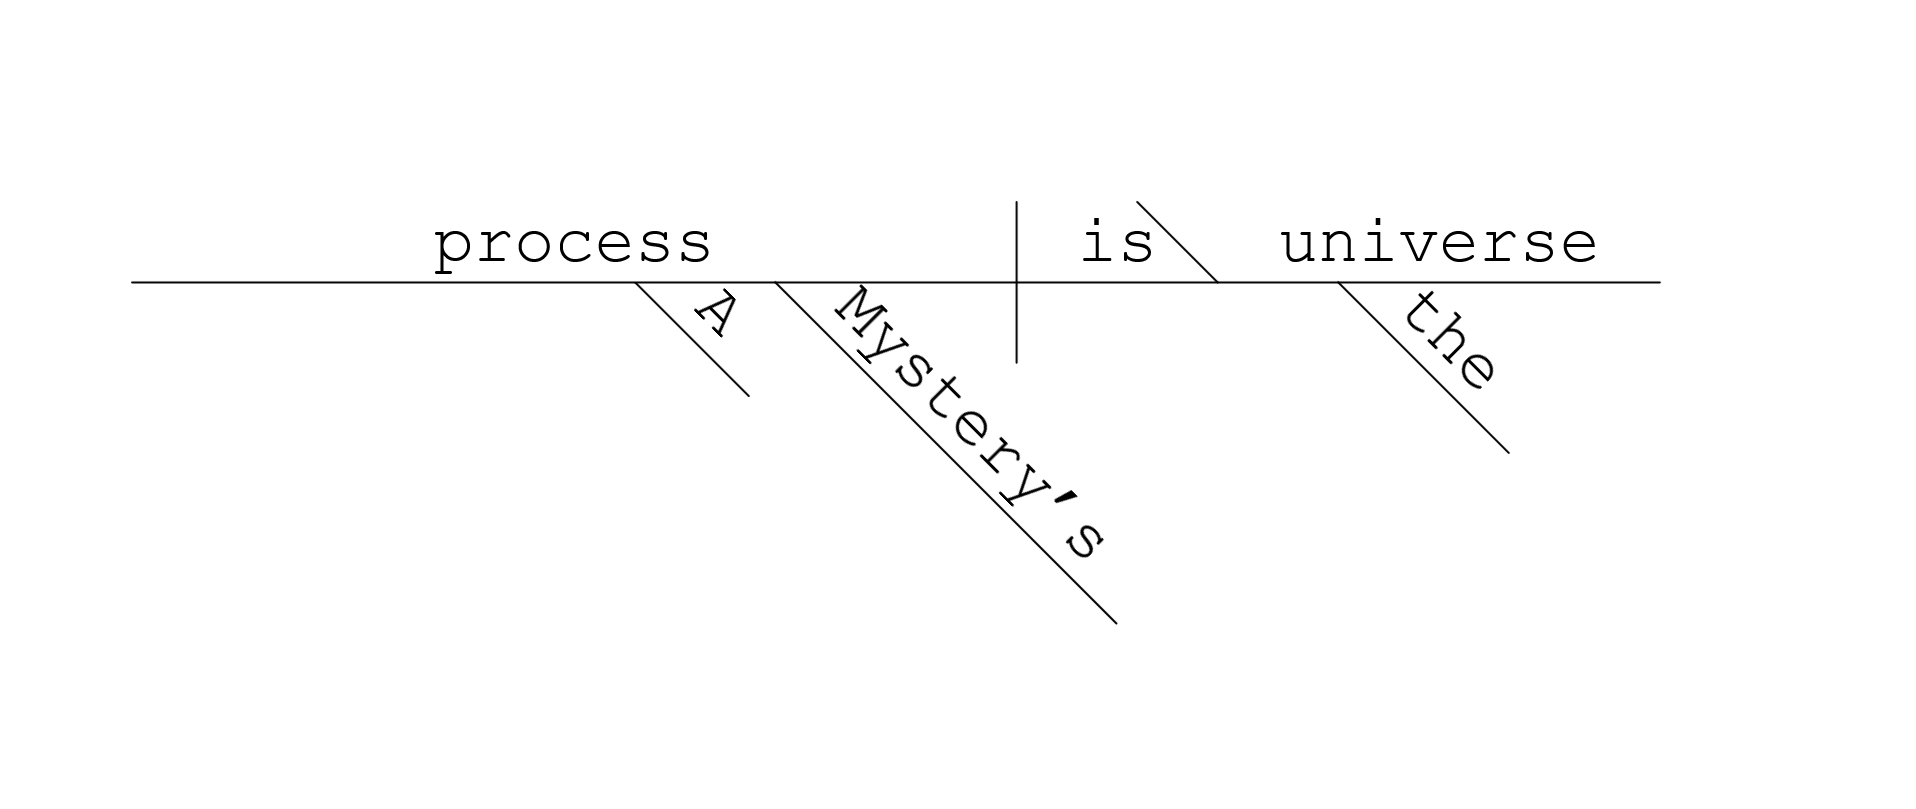 765 1 Diagram File Mcnarydam Wikimedia Commons Febco Wiring Ddc7015 Savitri Sentence Of 26